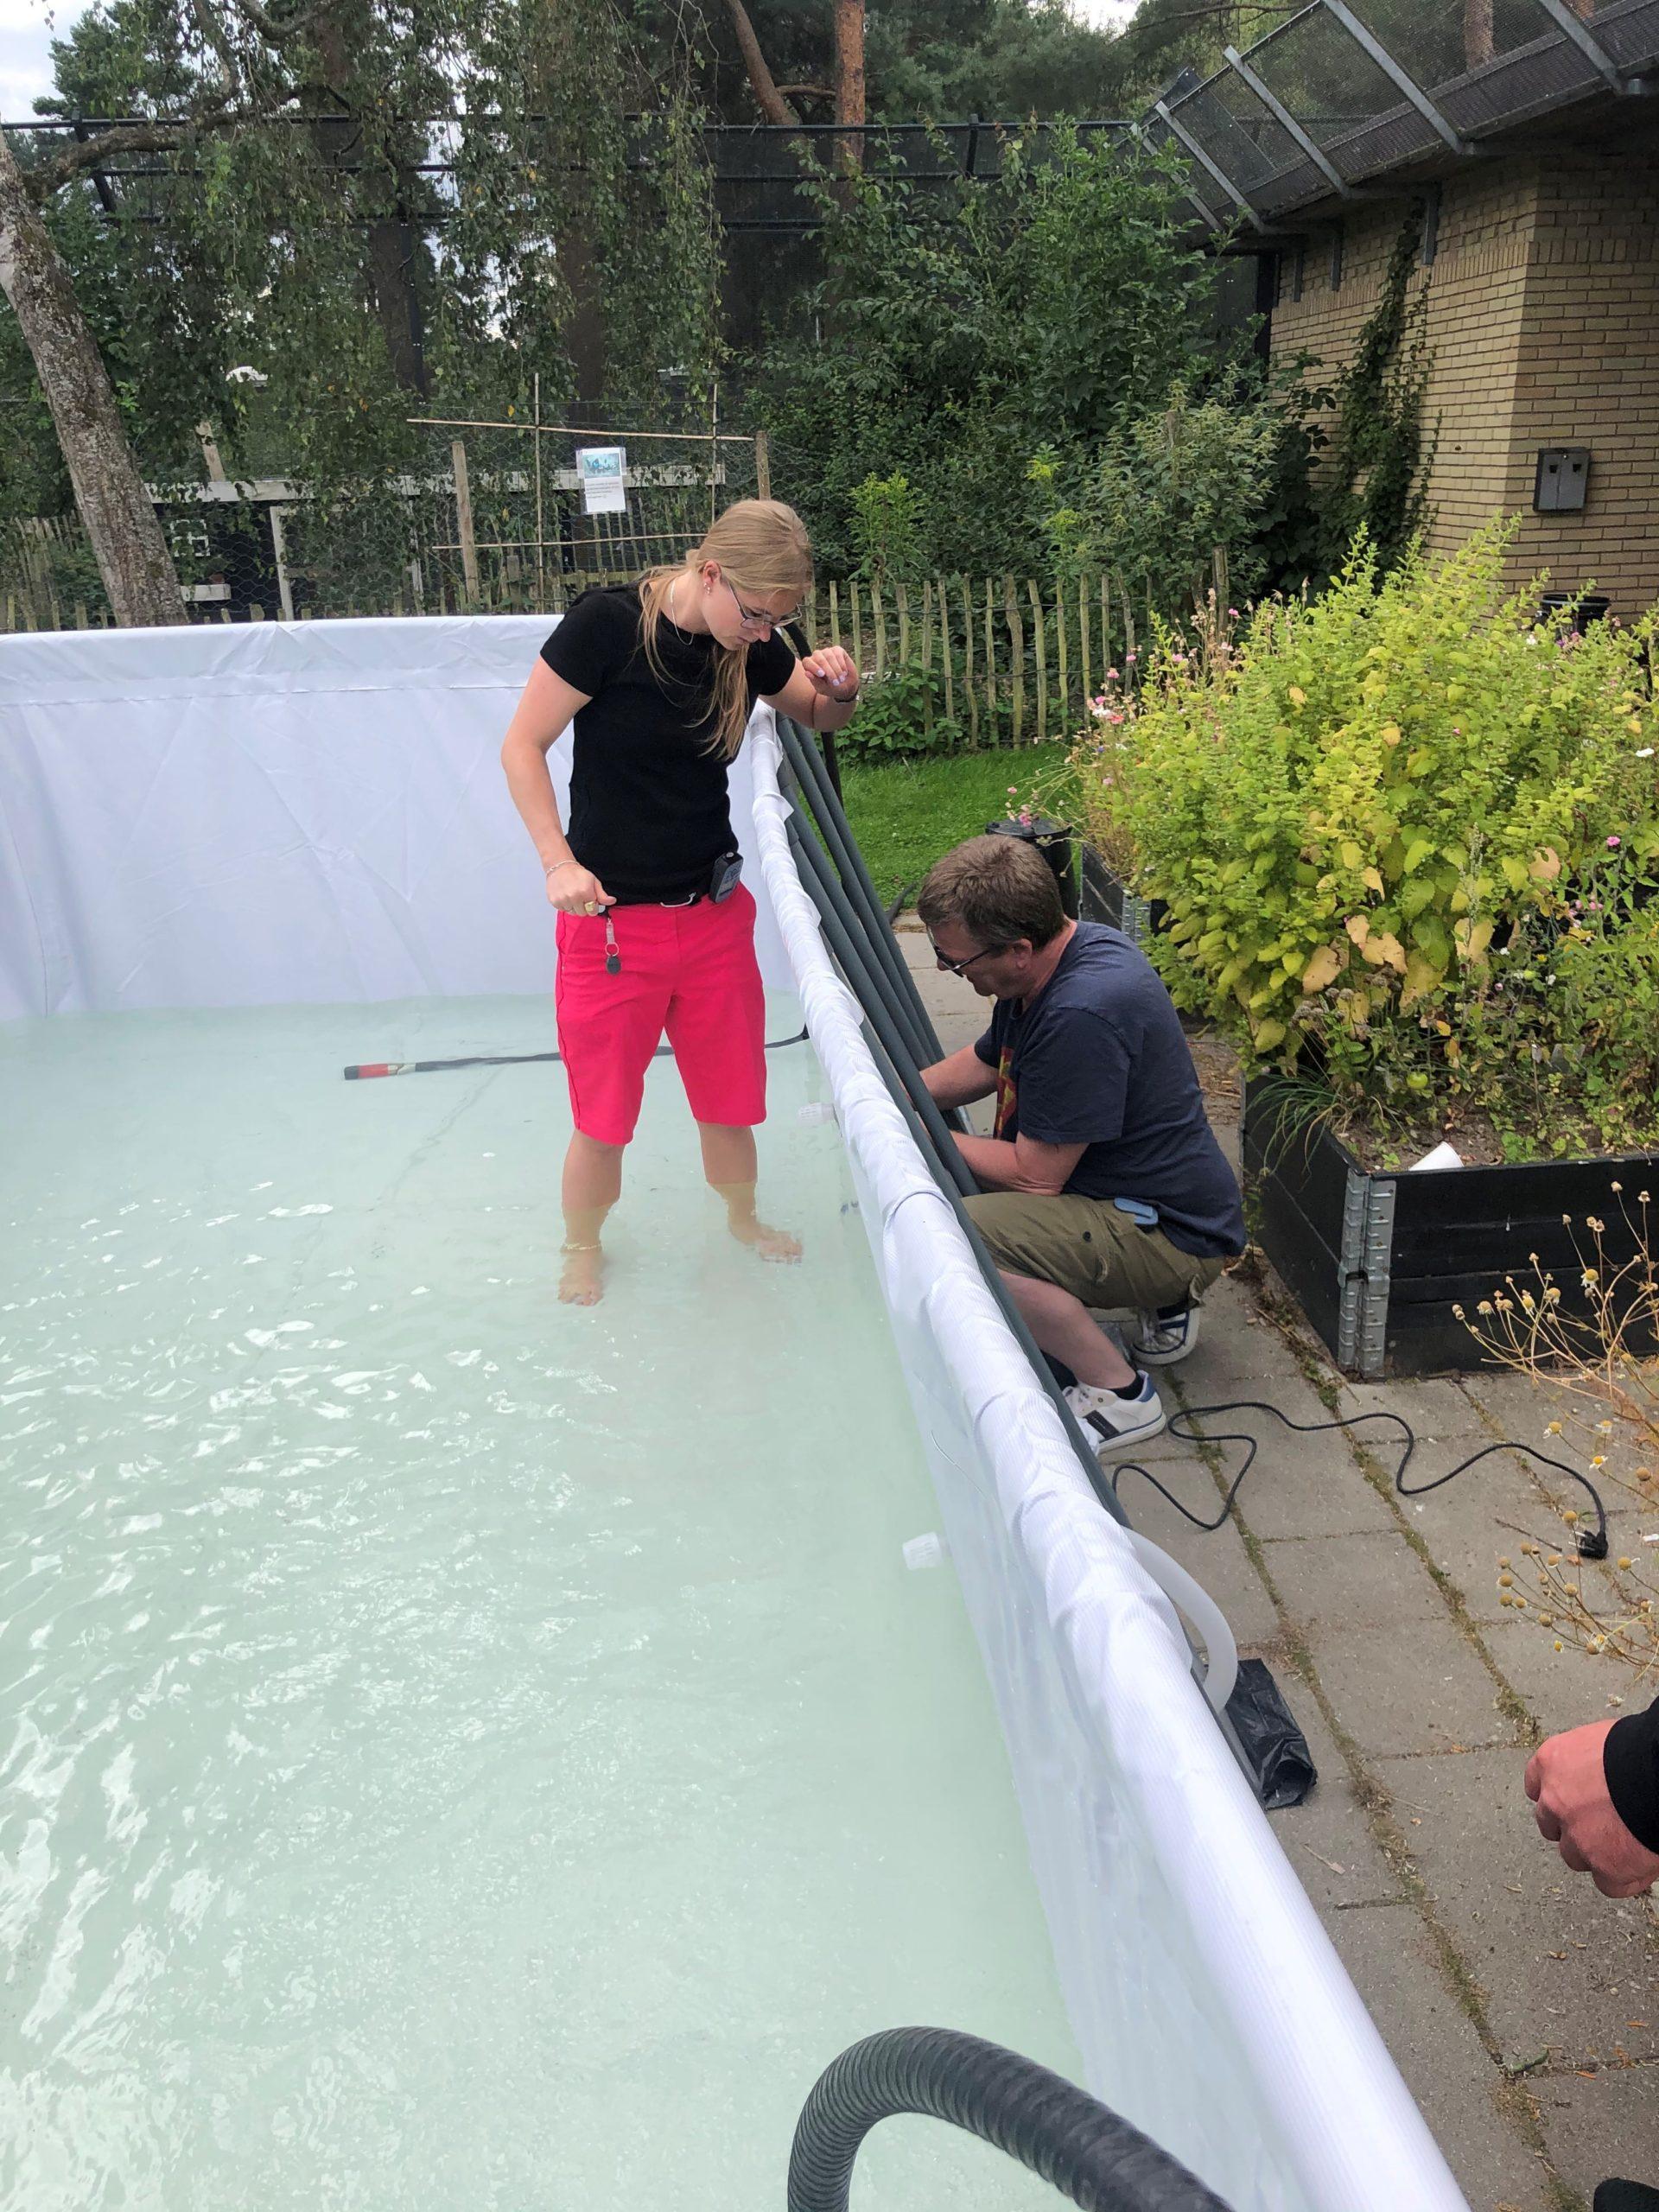 Håb i Psykiatrien badebassin pool Glostrup